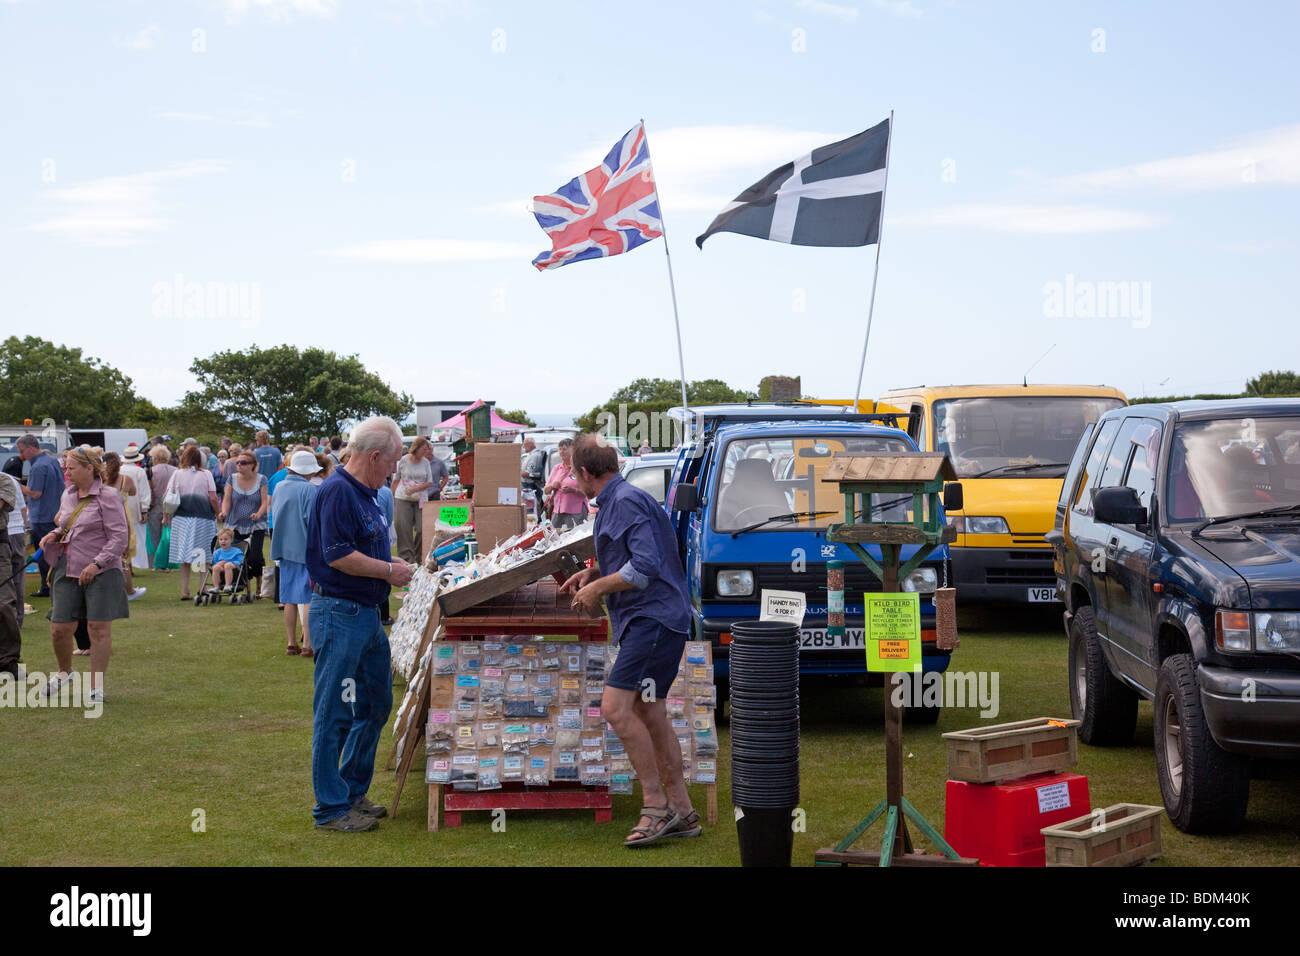 Flohmarkt car boot sale rosudgeon near penzance cornwall england united kingdom